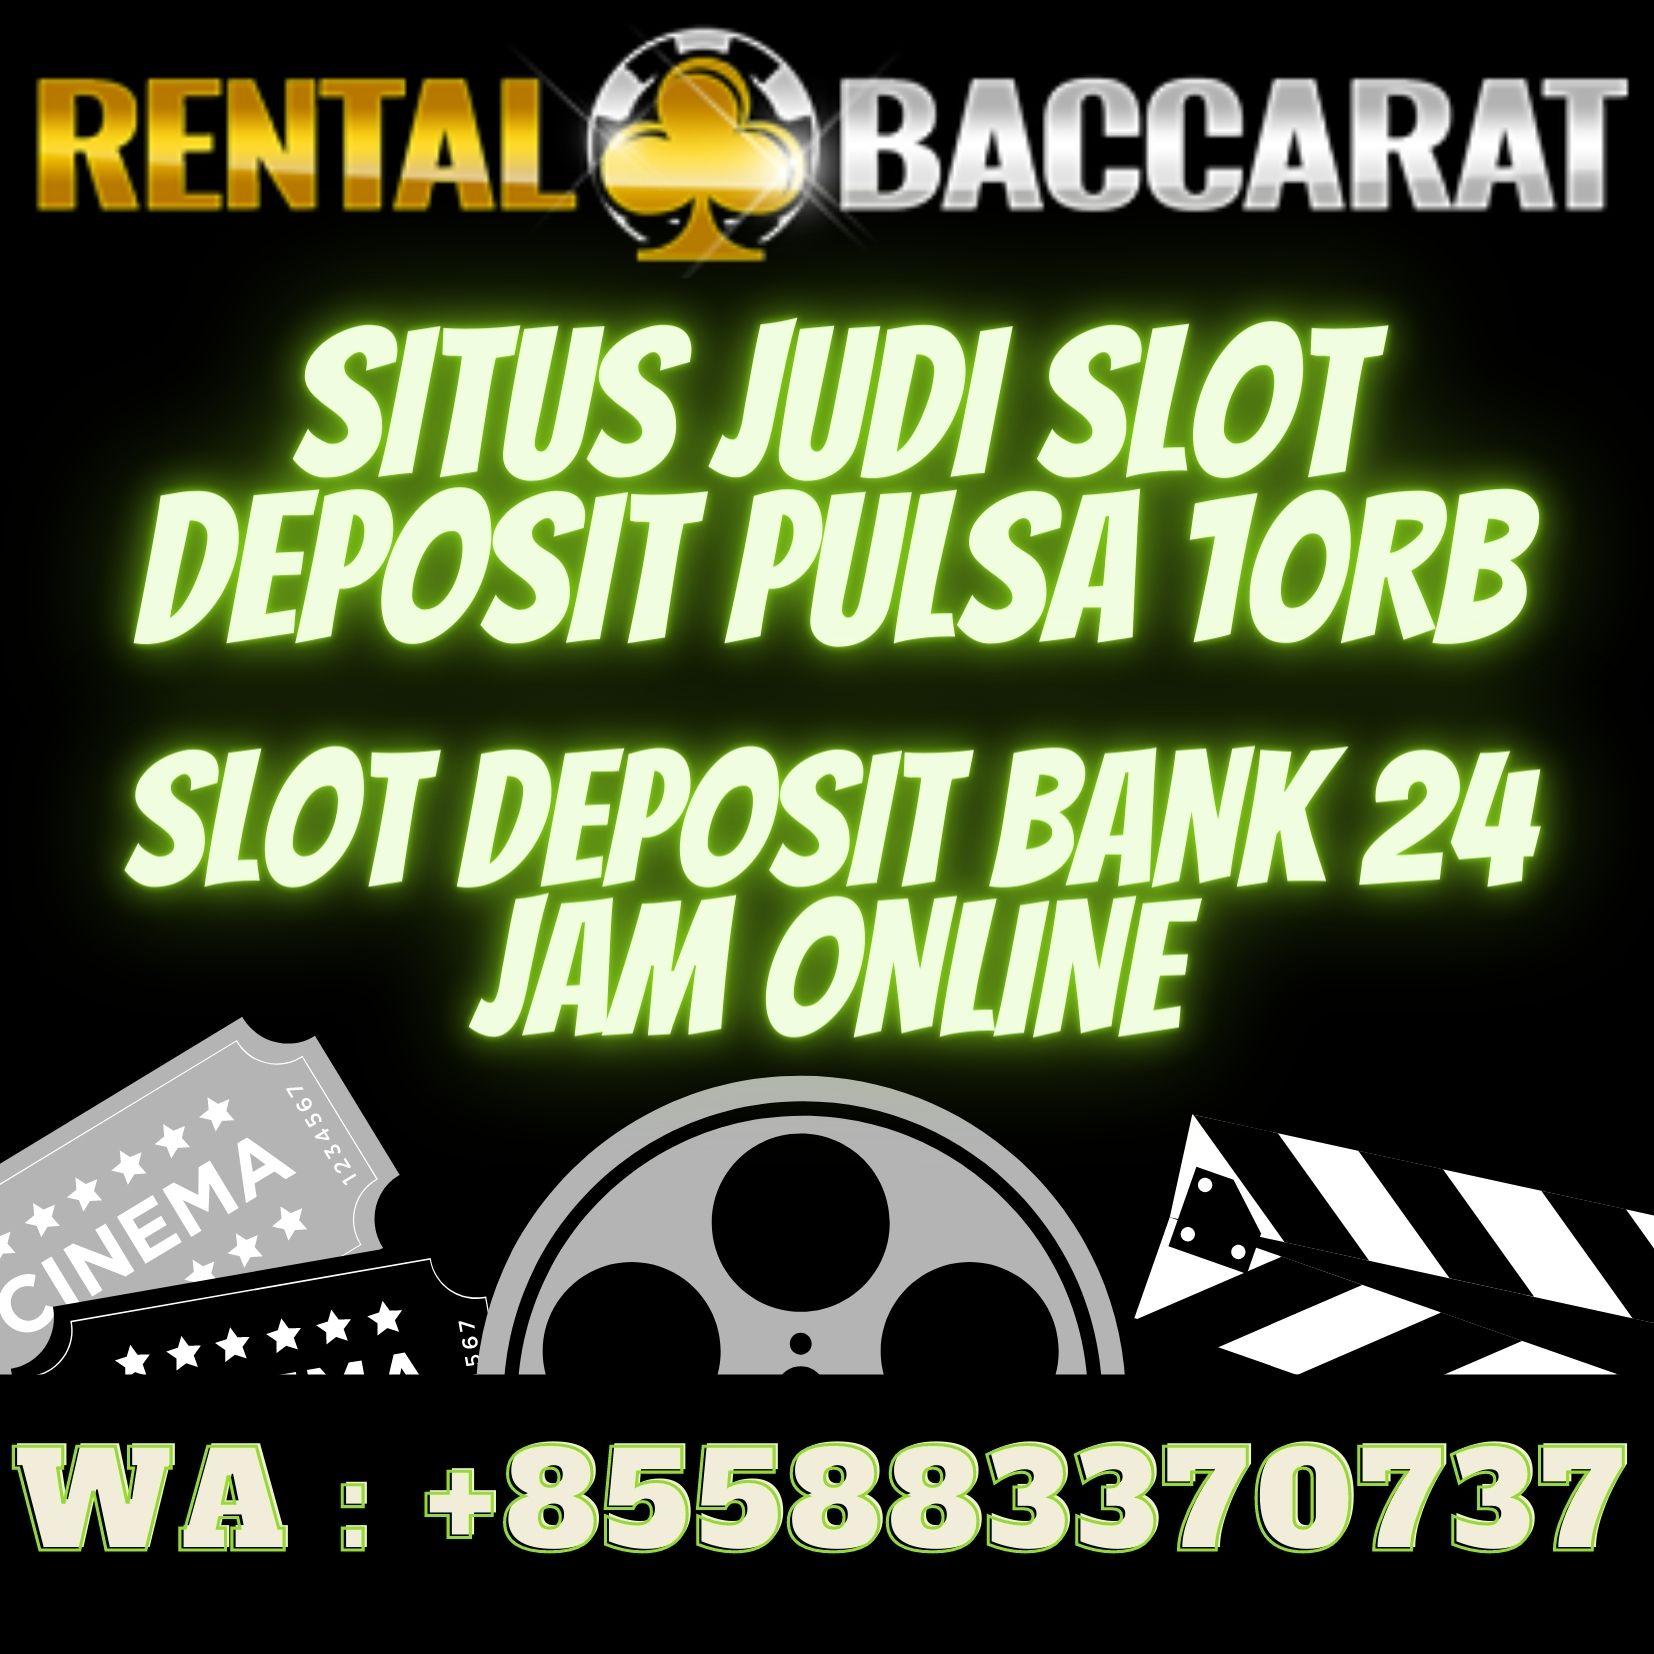 Daftar Situs Judi Mpo Slot Deposit Pulsa 10rb